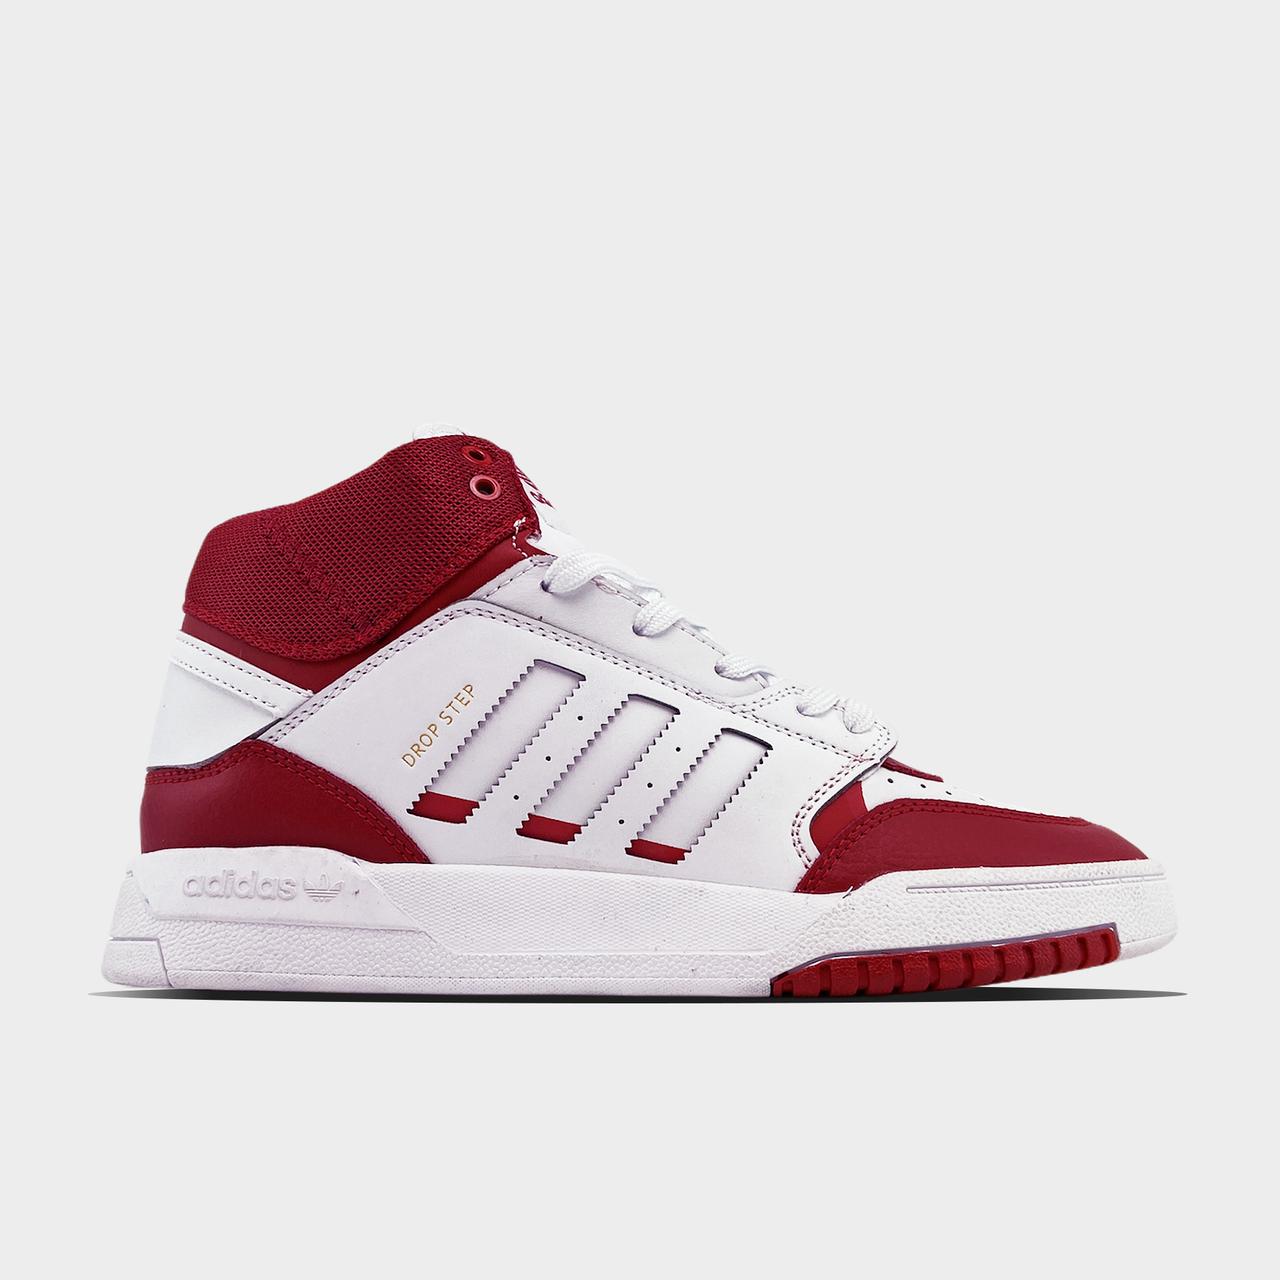 Ad!id@s, крос, обувь, взуття, sneakers, шузы, Drop Step Red White (Белый Красный)